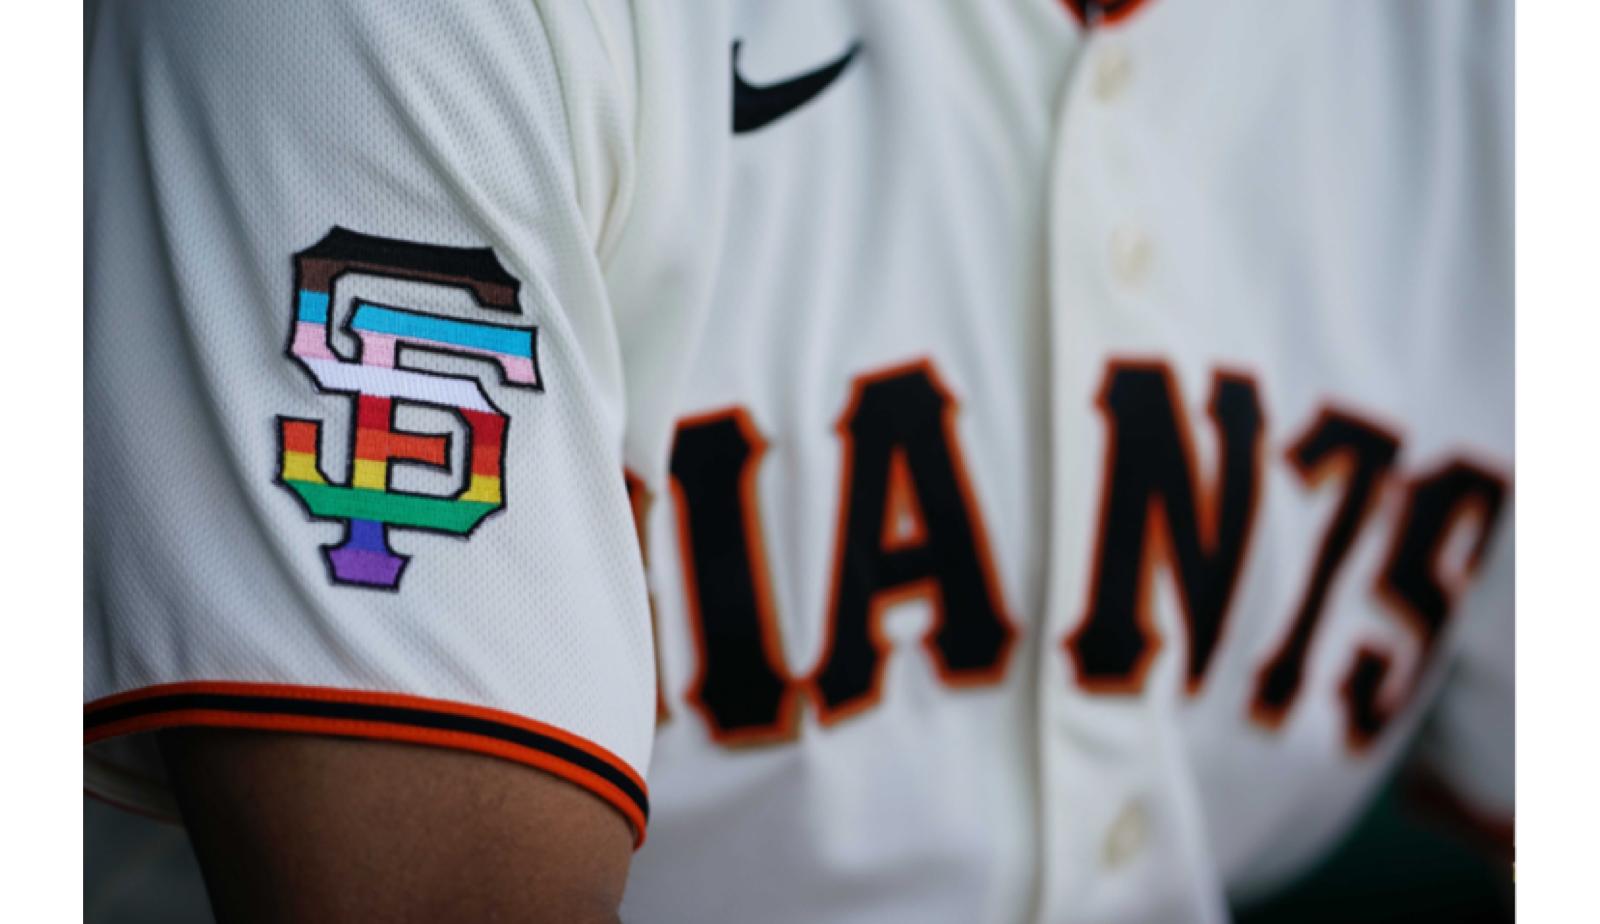 San Francisco Giants make sports history wearing Pride-themed uniforms